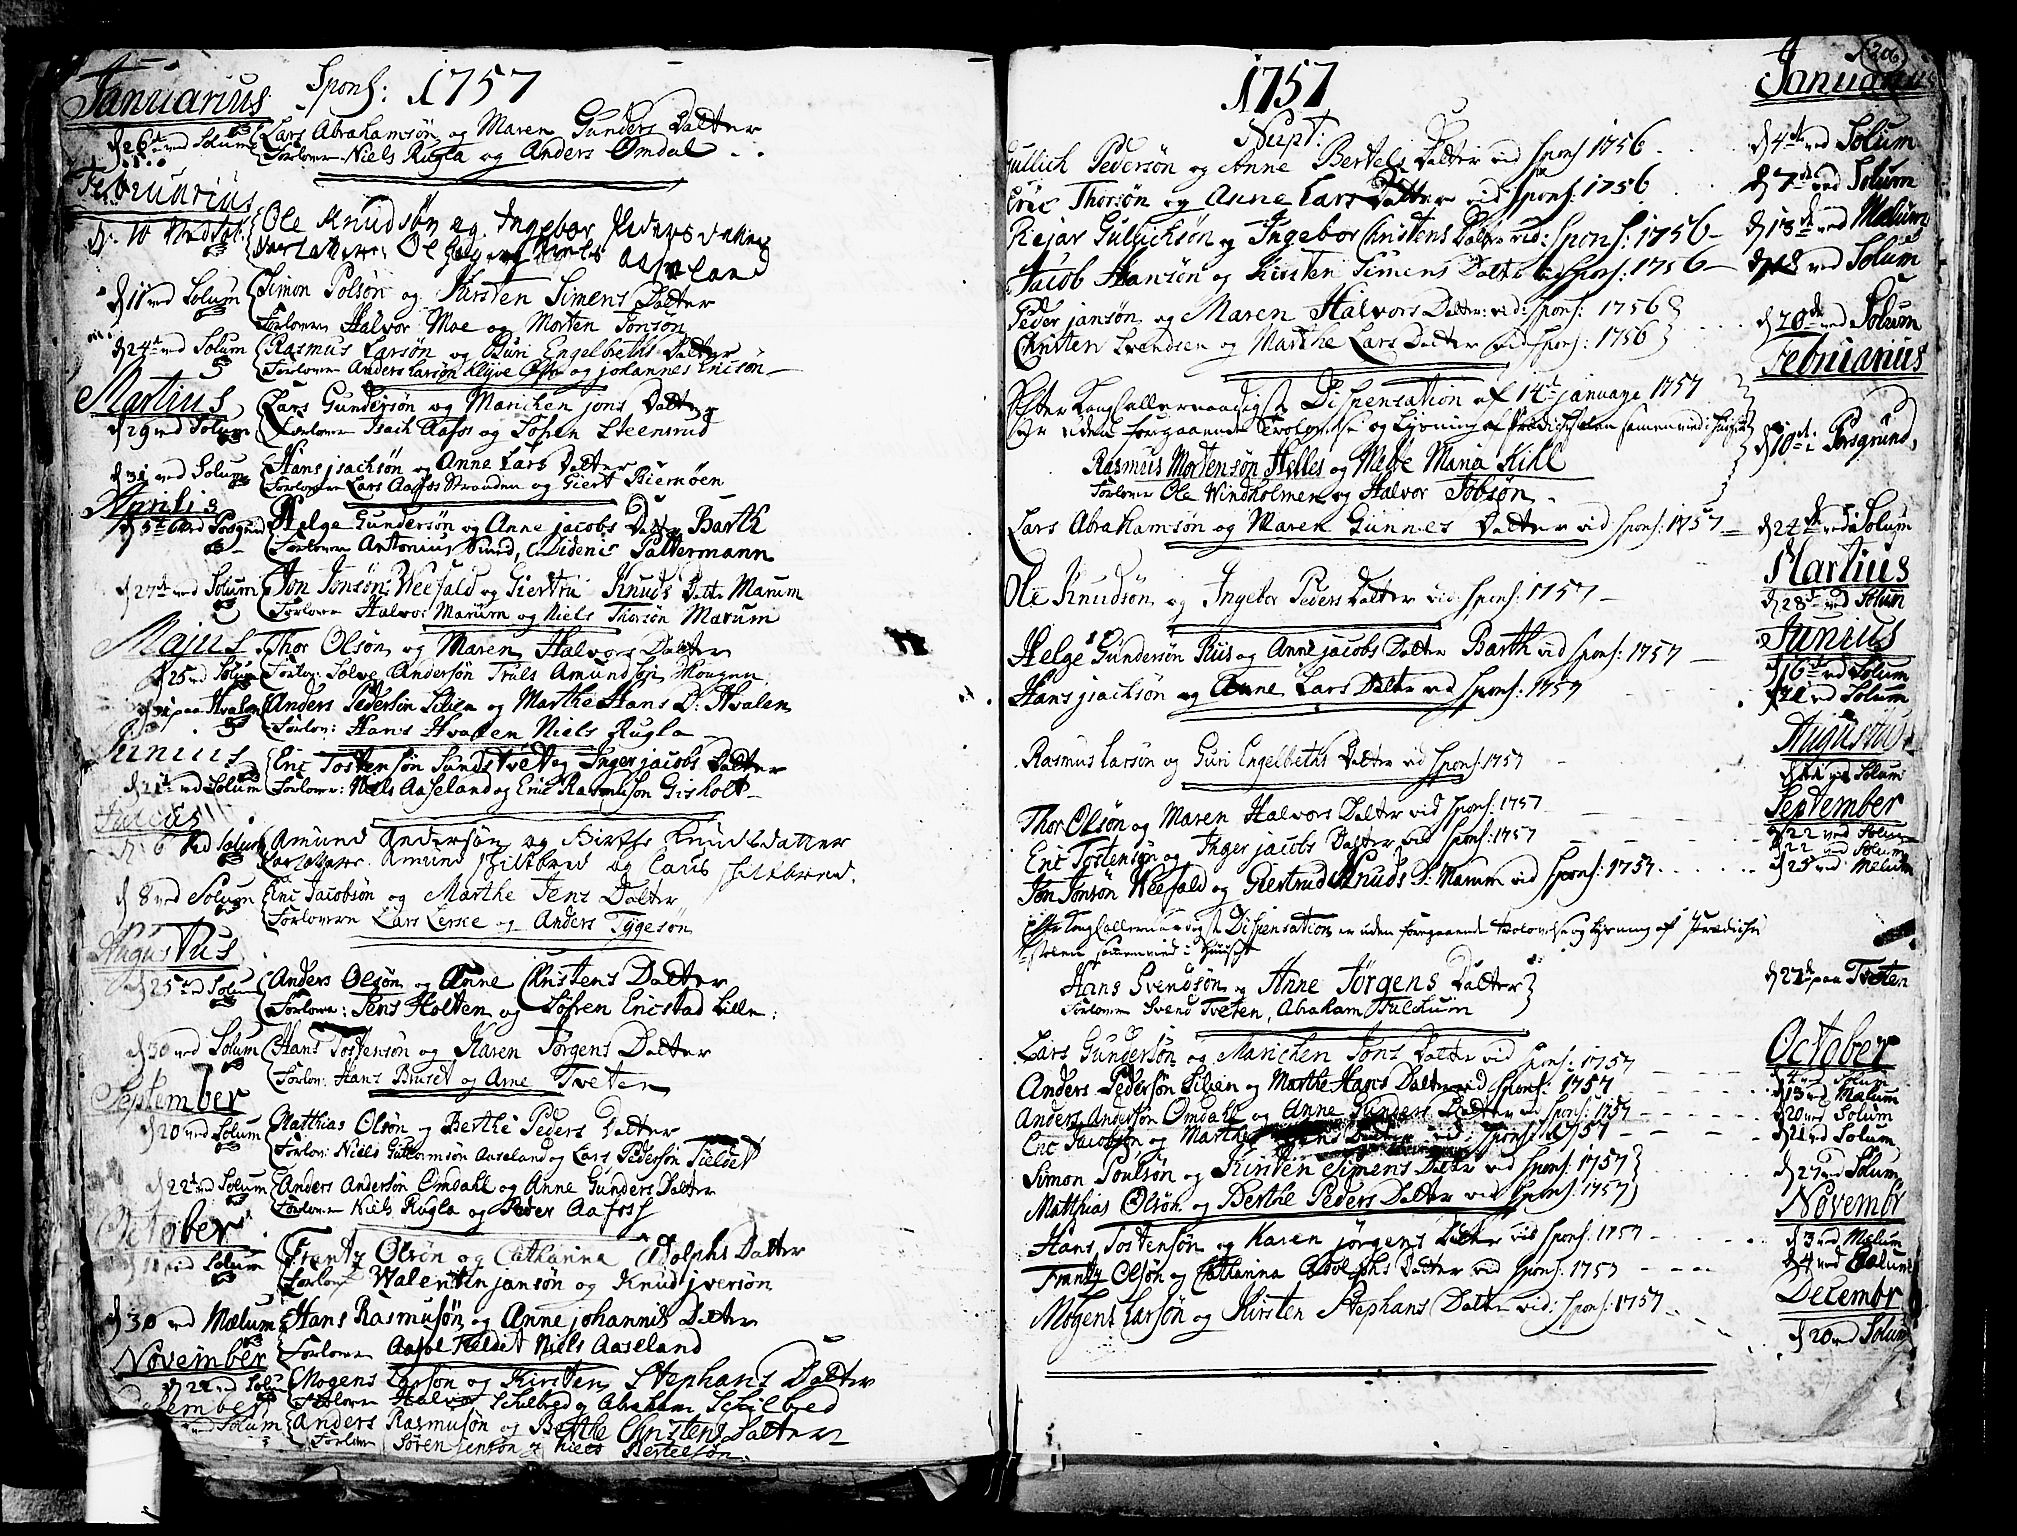 SAKO, Solum kirkebøker, F/Fa/L0002: Ministerialbok nr. I 2, 1713-1761, s. 206